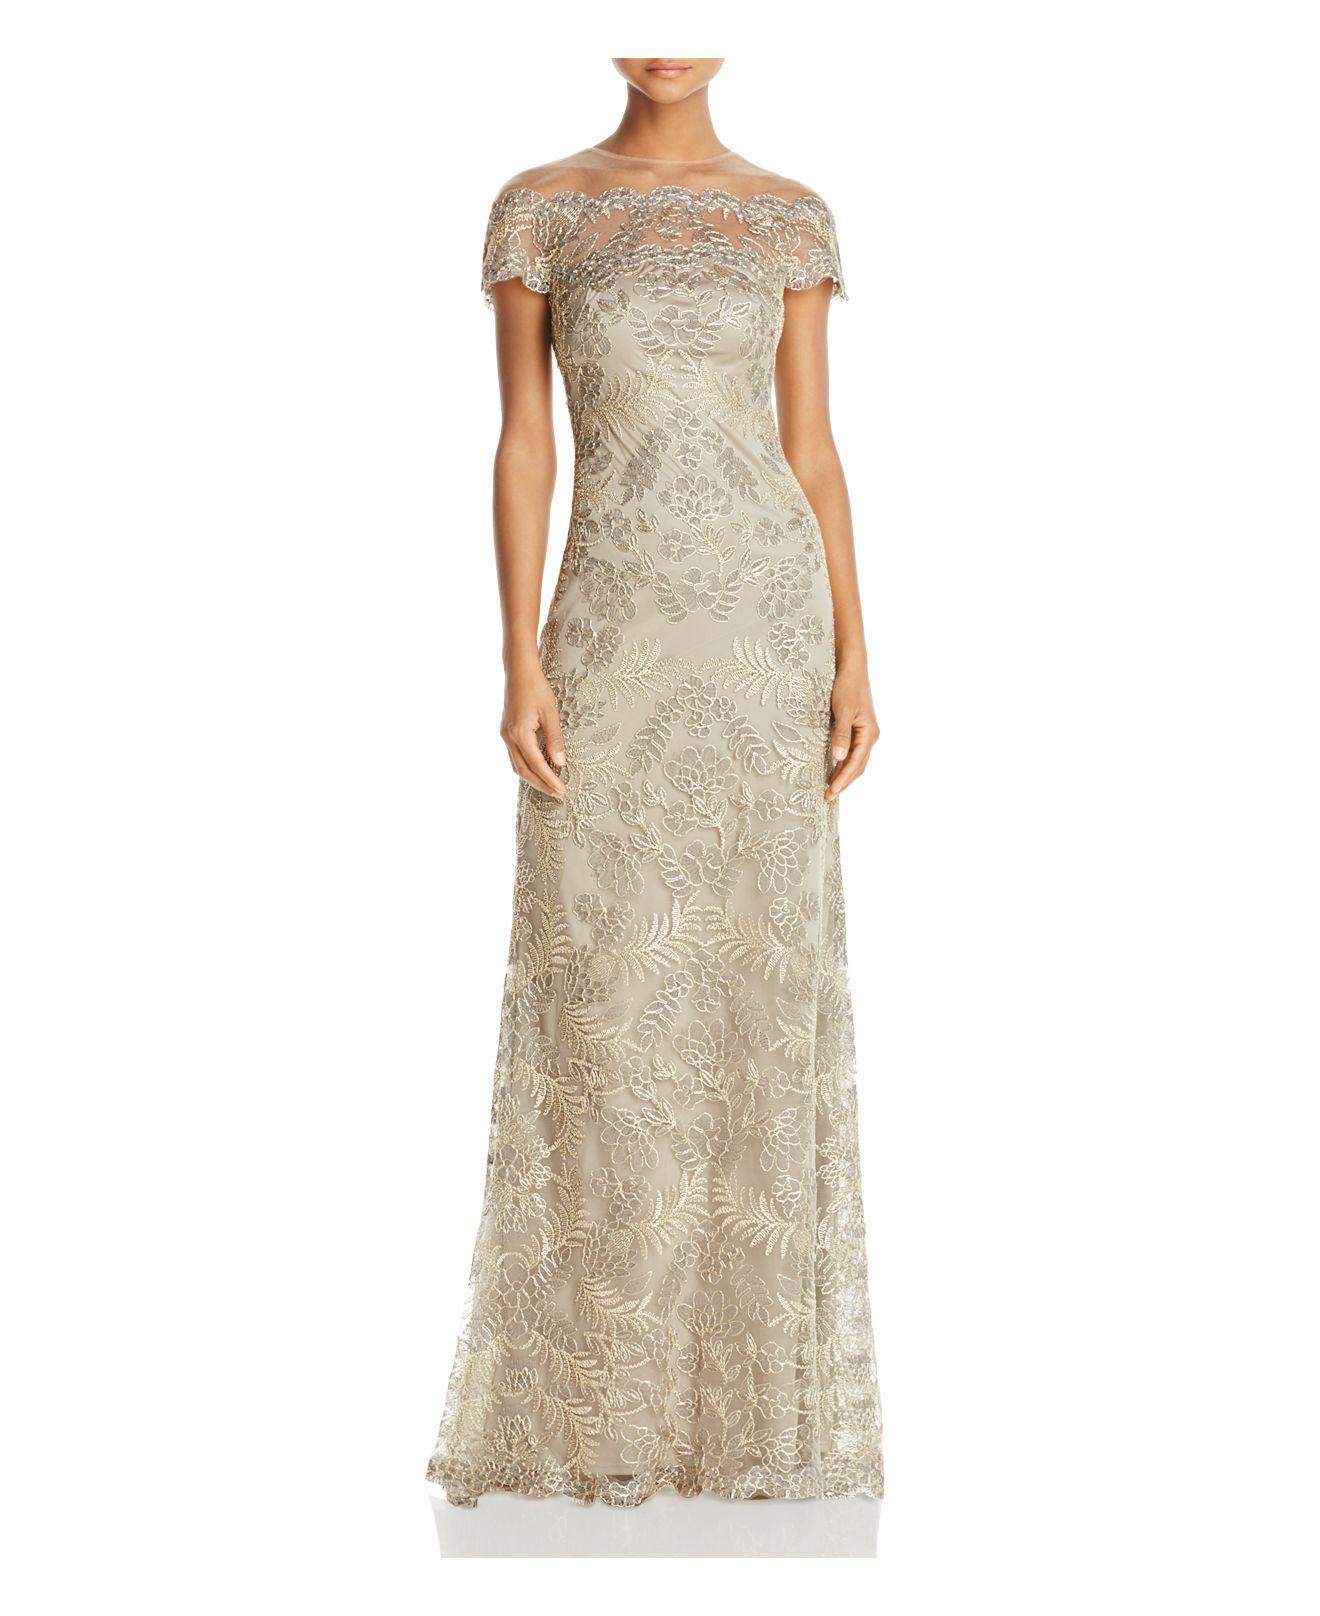 e70df4150fd Lyst - Tadashi Shoji Illusion Off-the-shoulder Lace Gown